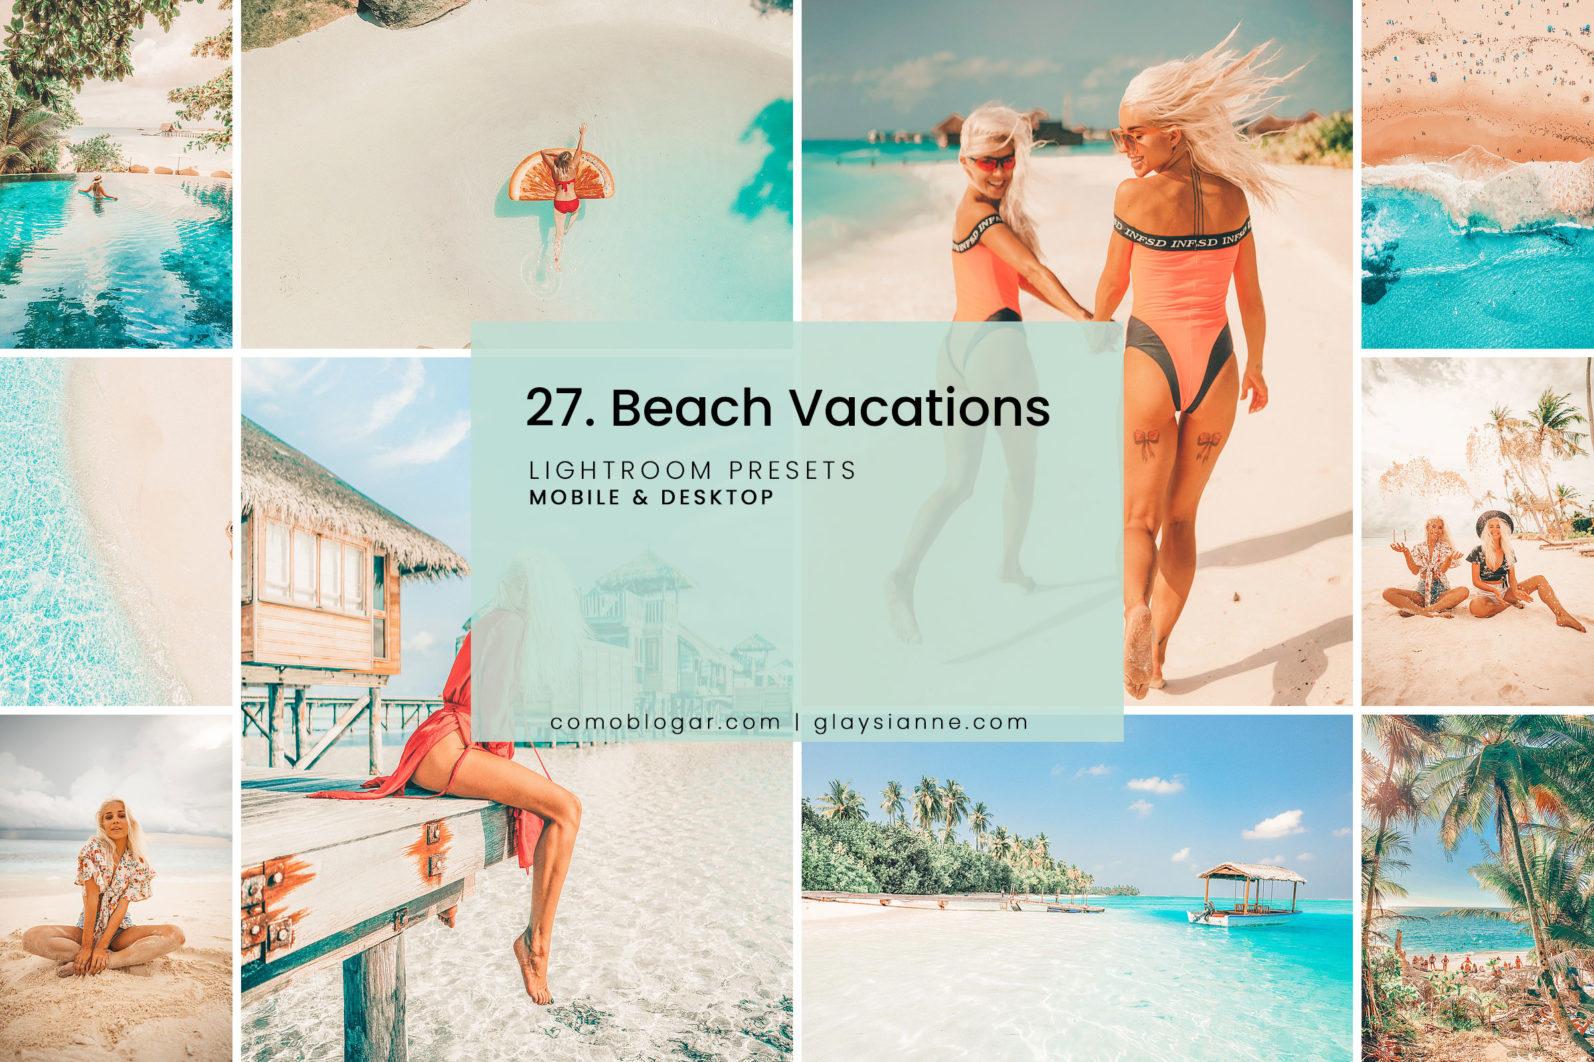 27. Beach Vacation Presets - 27.BEACHVACATIONS 1 1 -